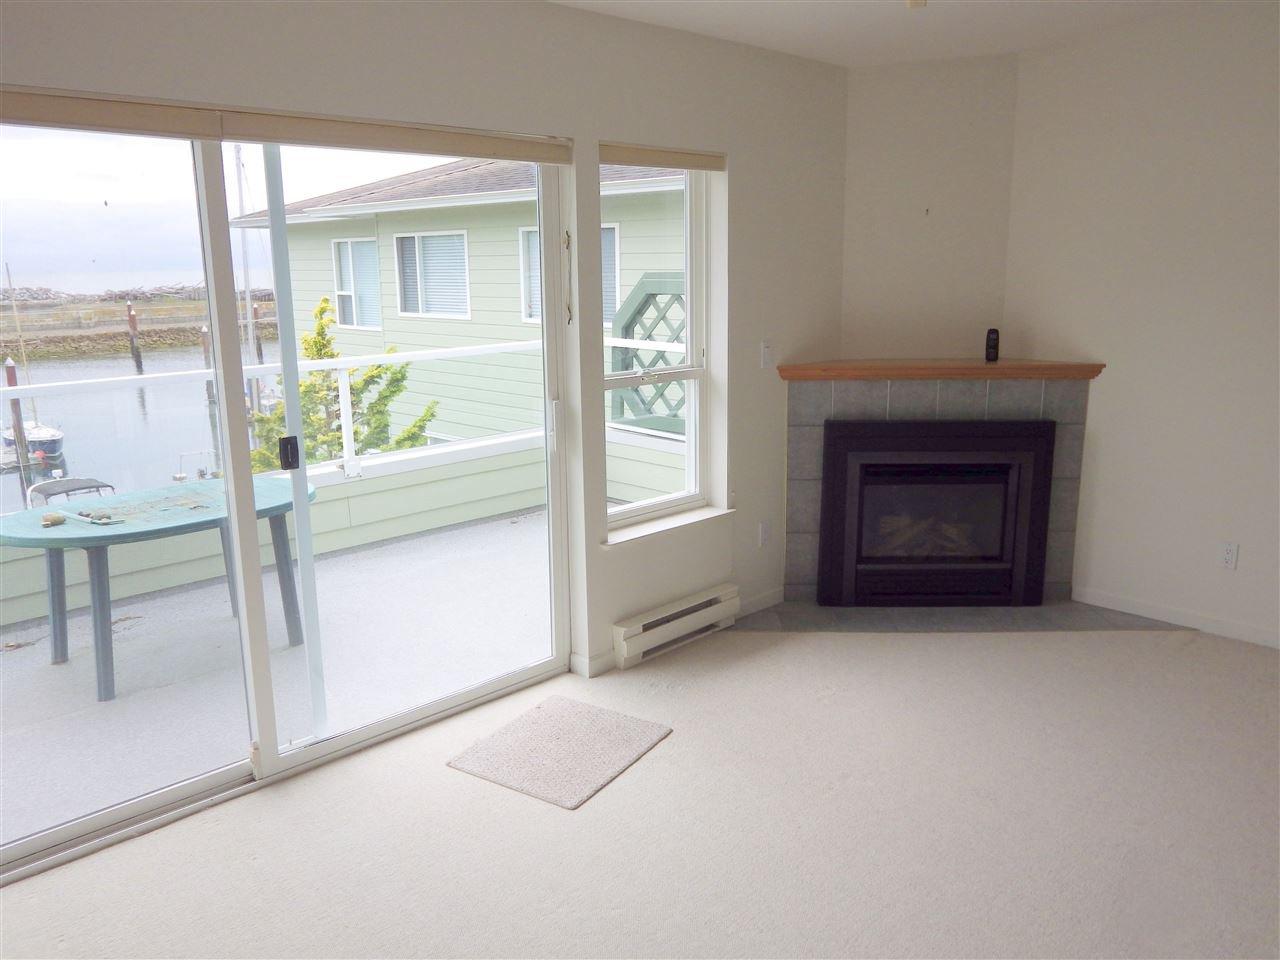 Photo 3: Photos: 207 1585 FIELD Road in Sechelt: Sechelt District Condo for sale (Sunshine Coast)  : MLS®# R2471792